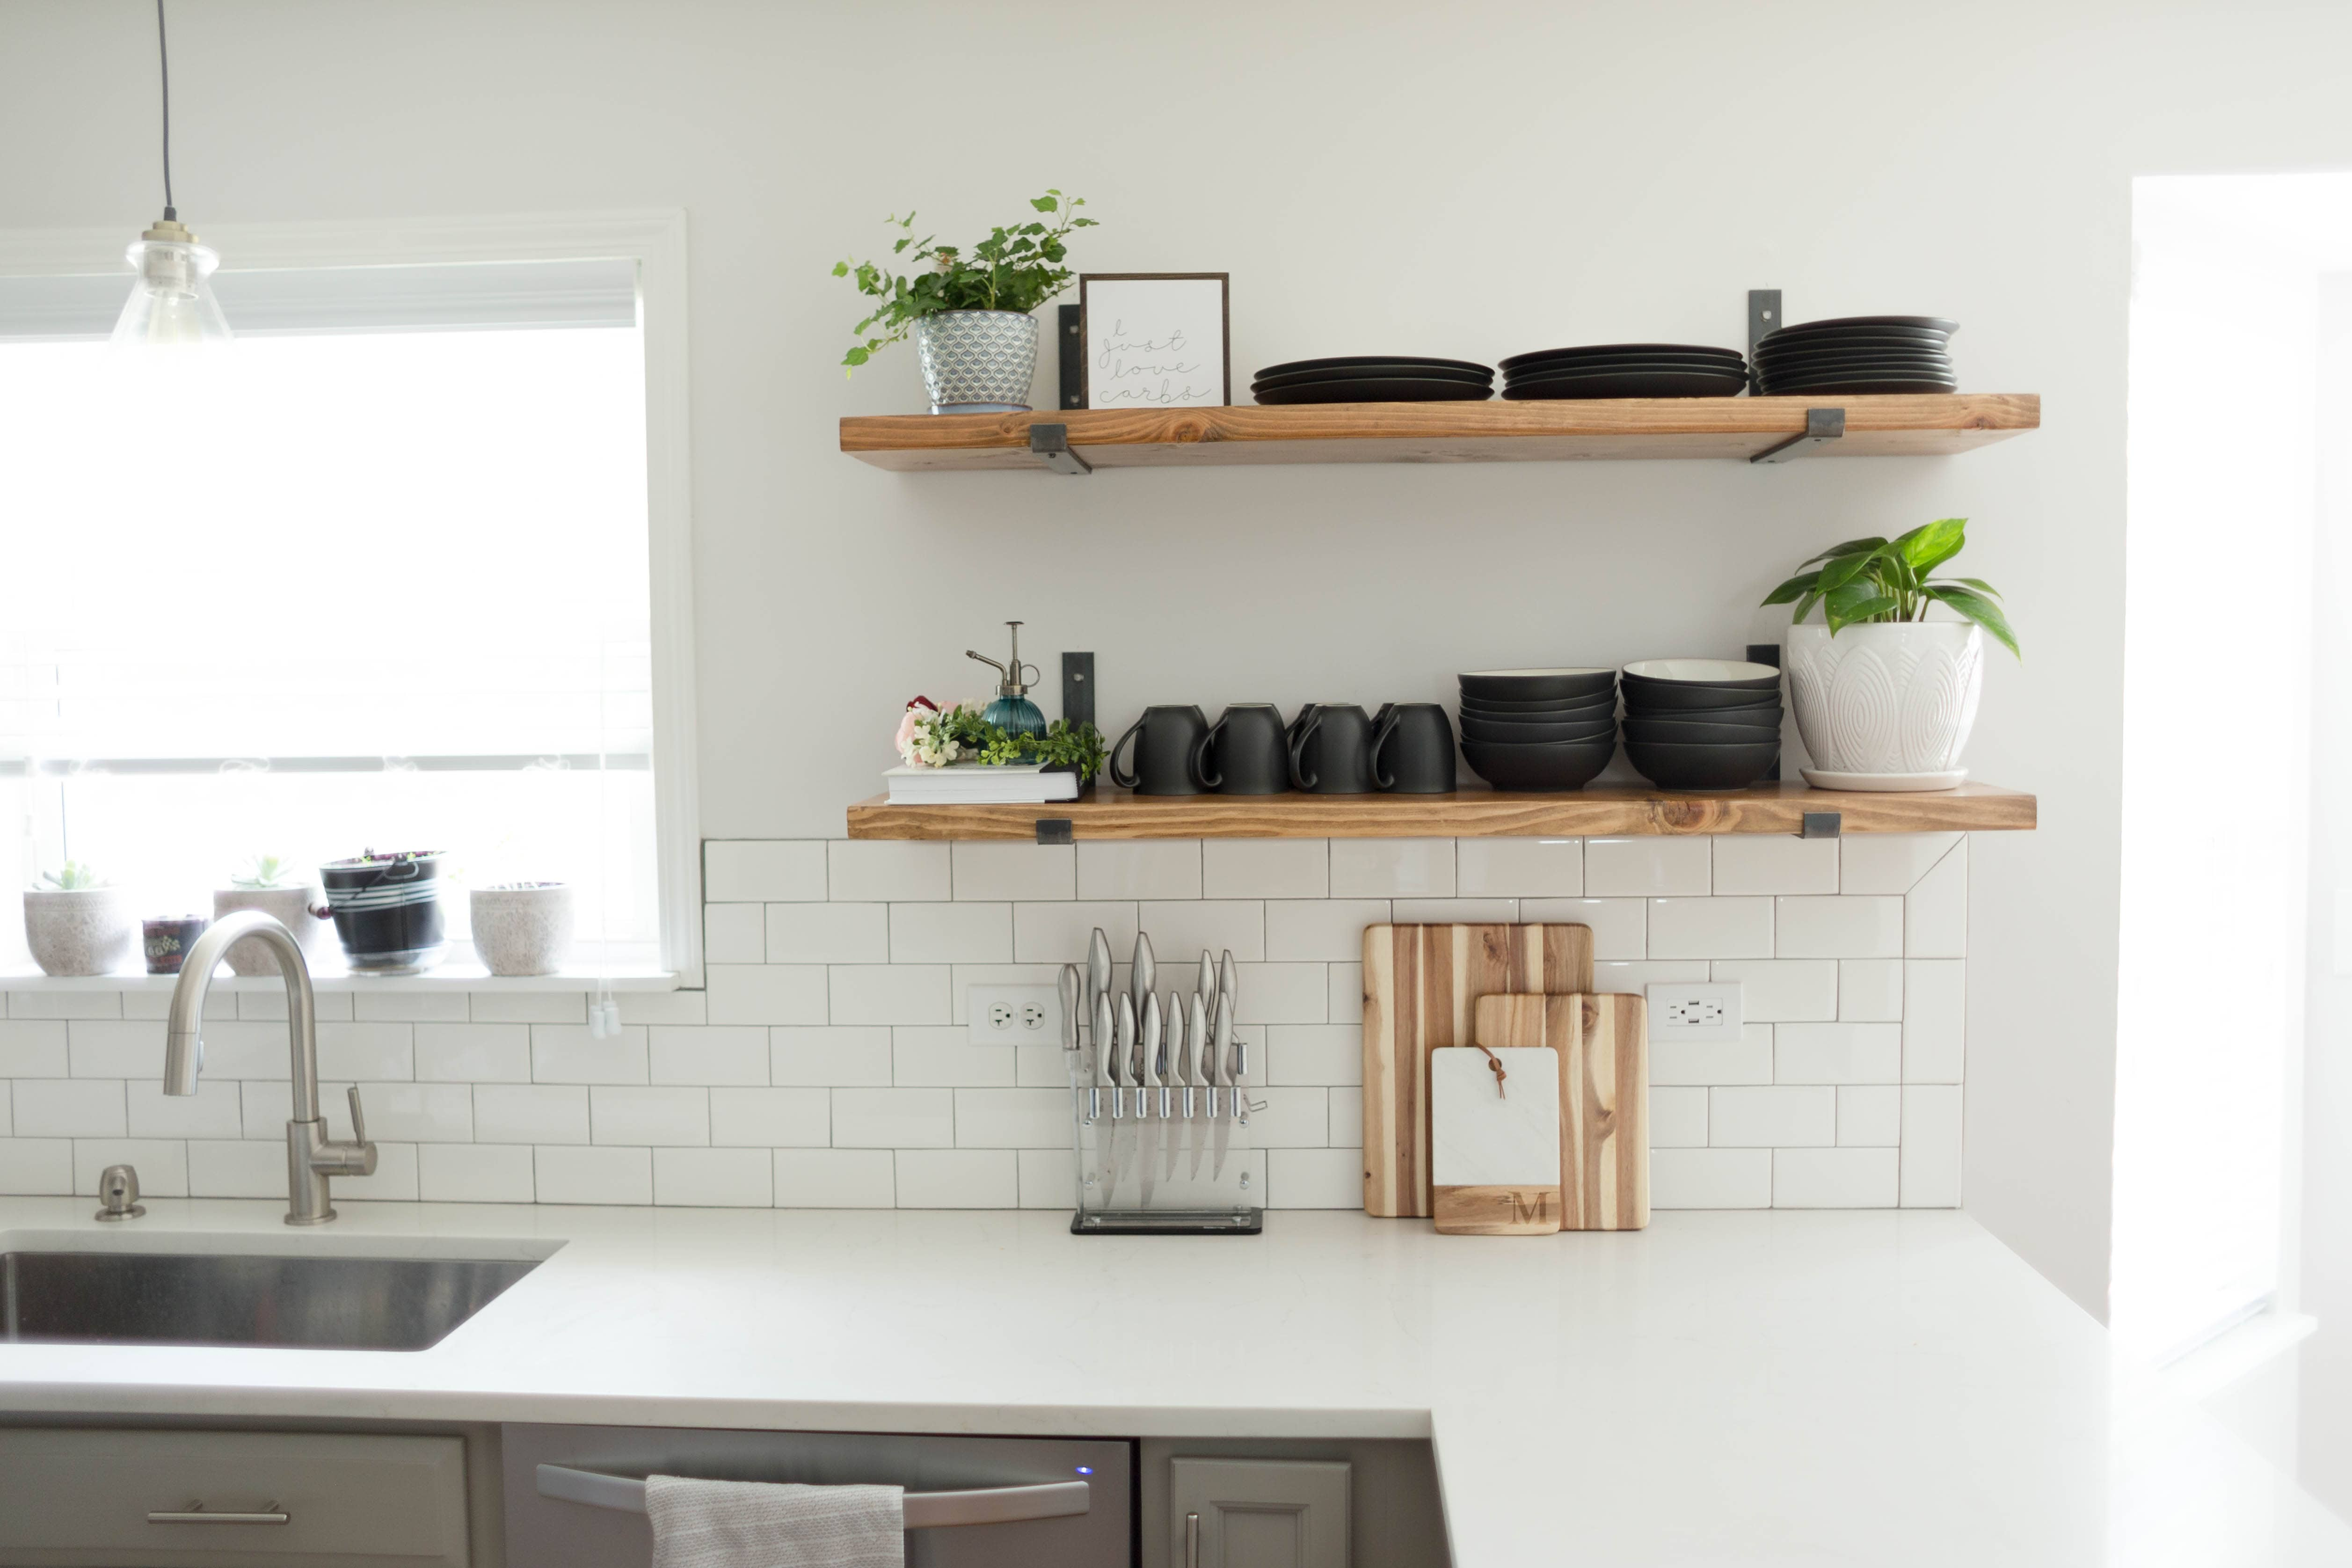 DIY Kitchen Open Shelving | Sammy On State